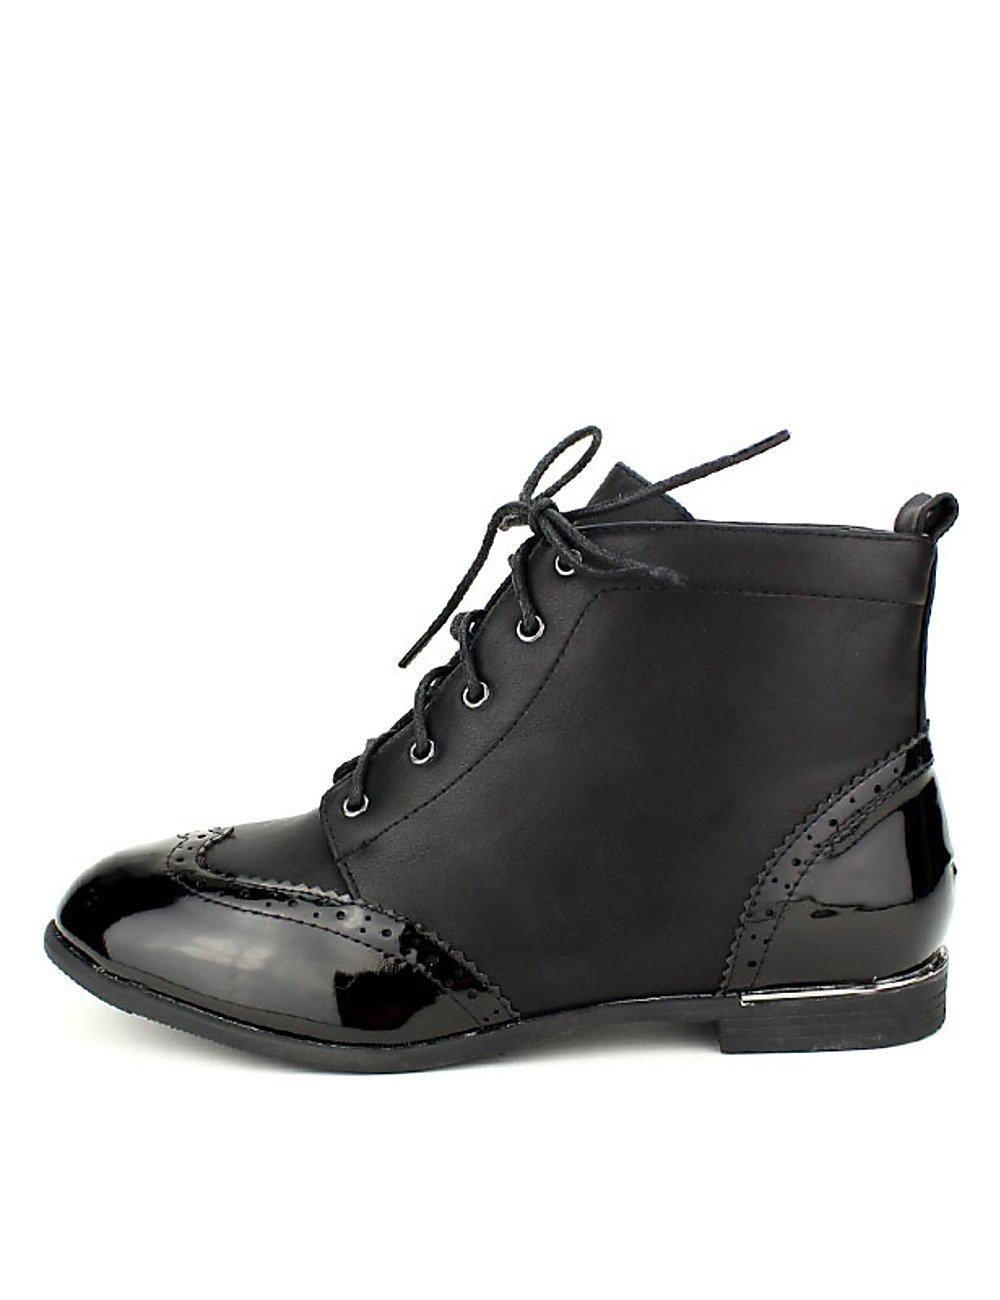 Cendriyon, B07F6SQGM2 SLOWY Bottine Noire Bi Femme matière SLOWY Chaussures Femme Noir 4351f7e - fast-weightloss-diet.space